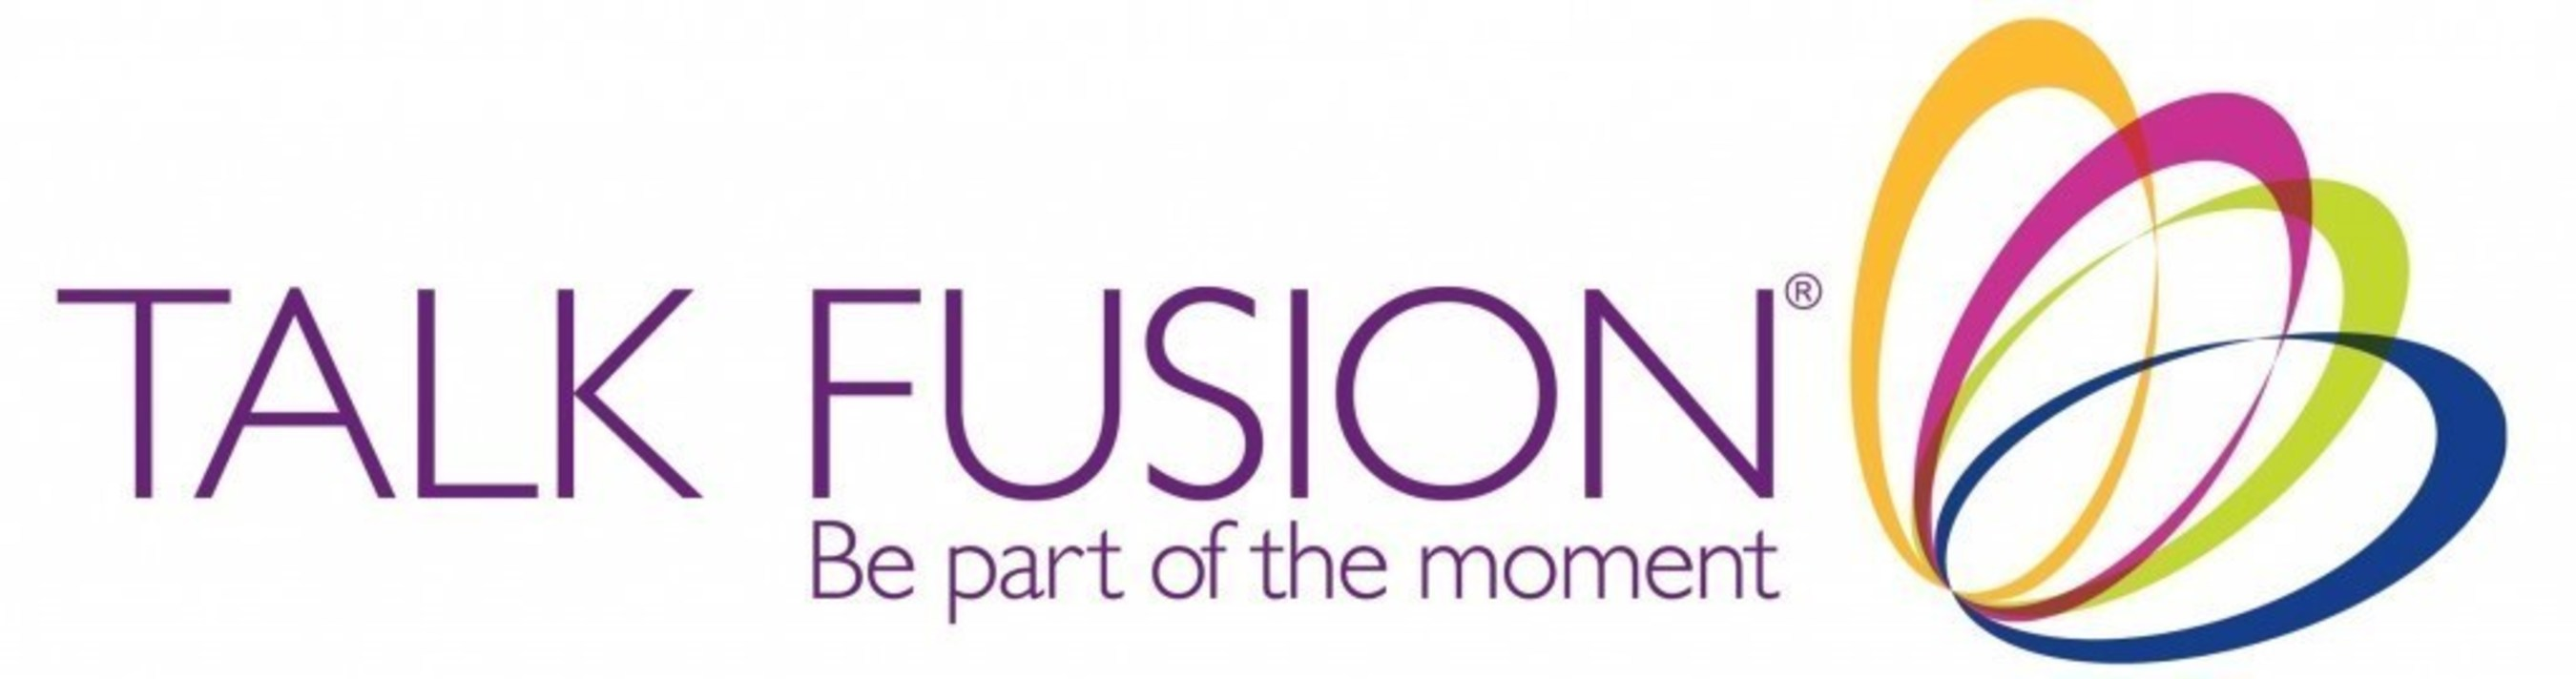 Video Marketing Leader Talk Fusion Launches WebRTC Recorder